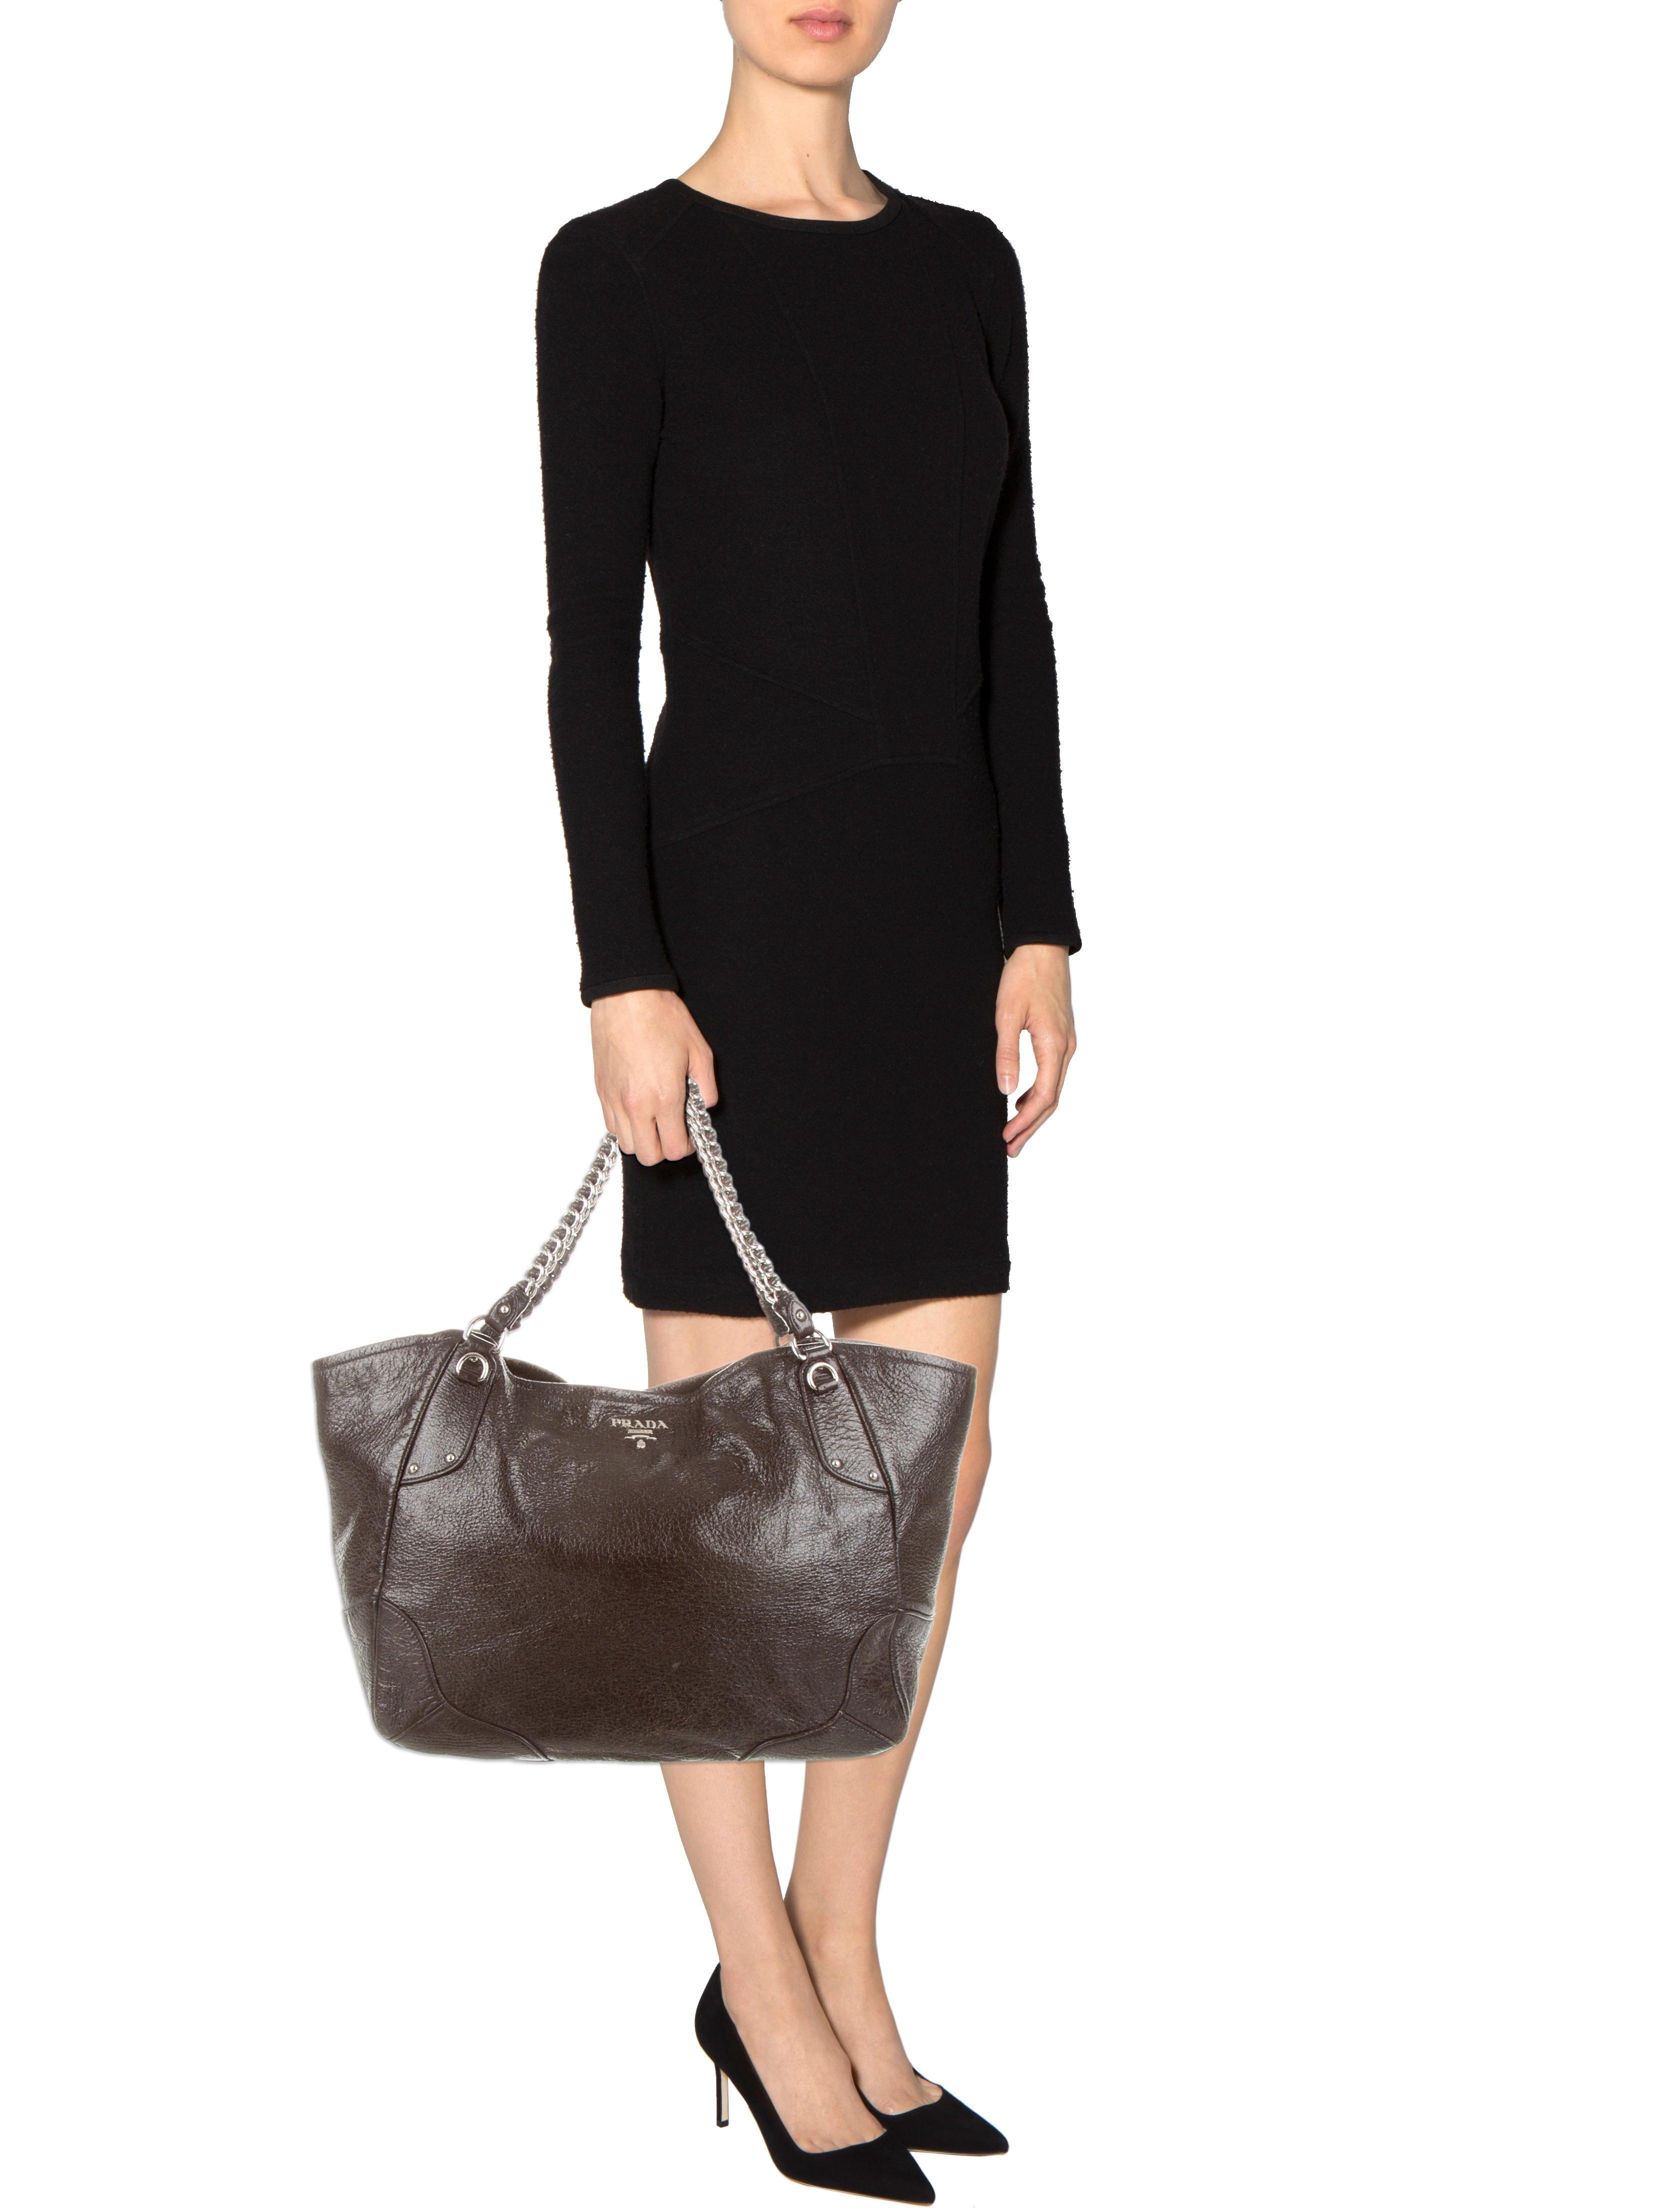 diaper bags prada - Prada Cervo Lux Chain Tote - Handbags - PRA71733 | The RealReal